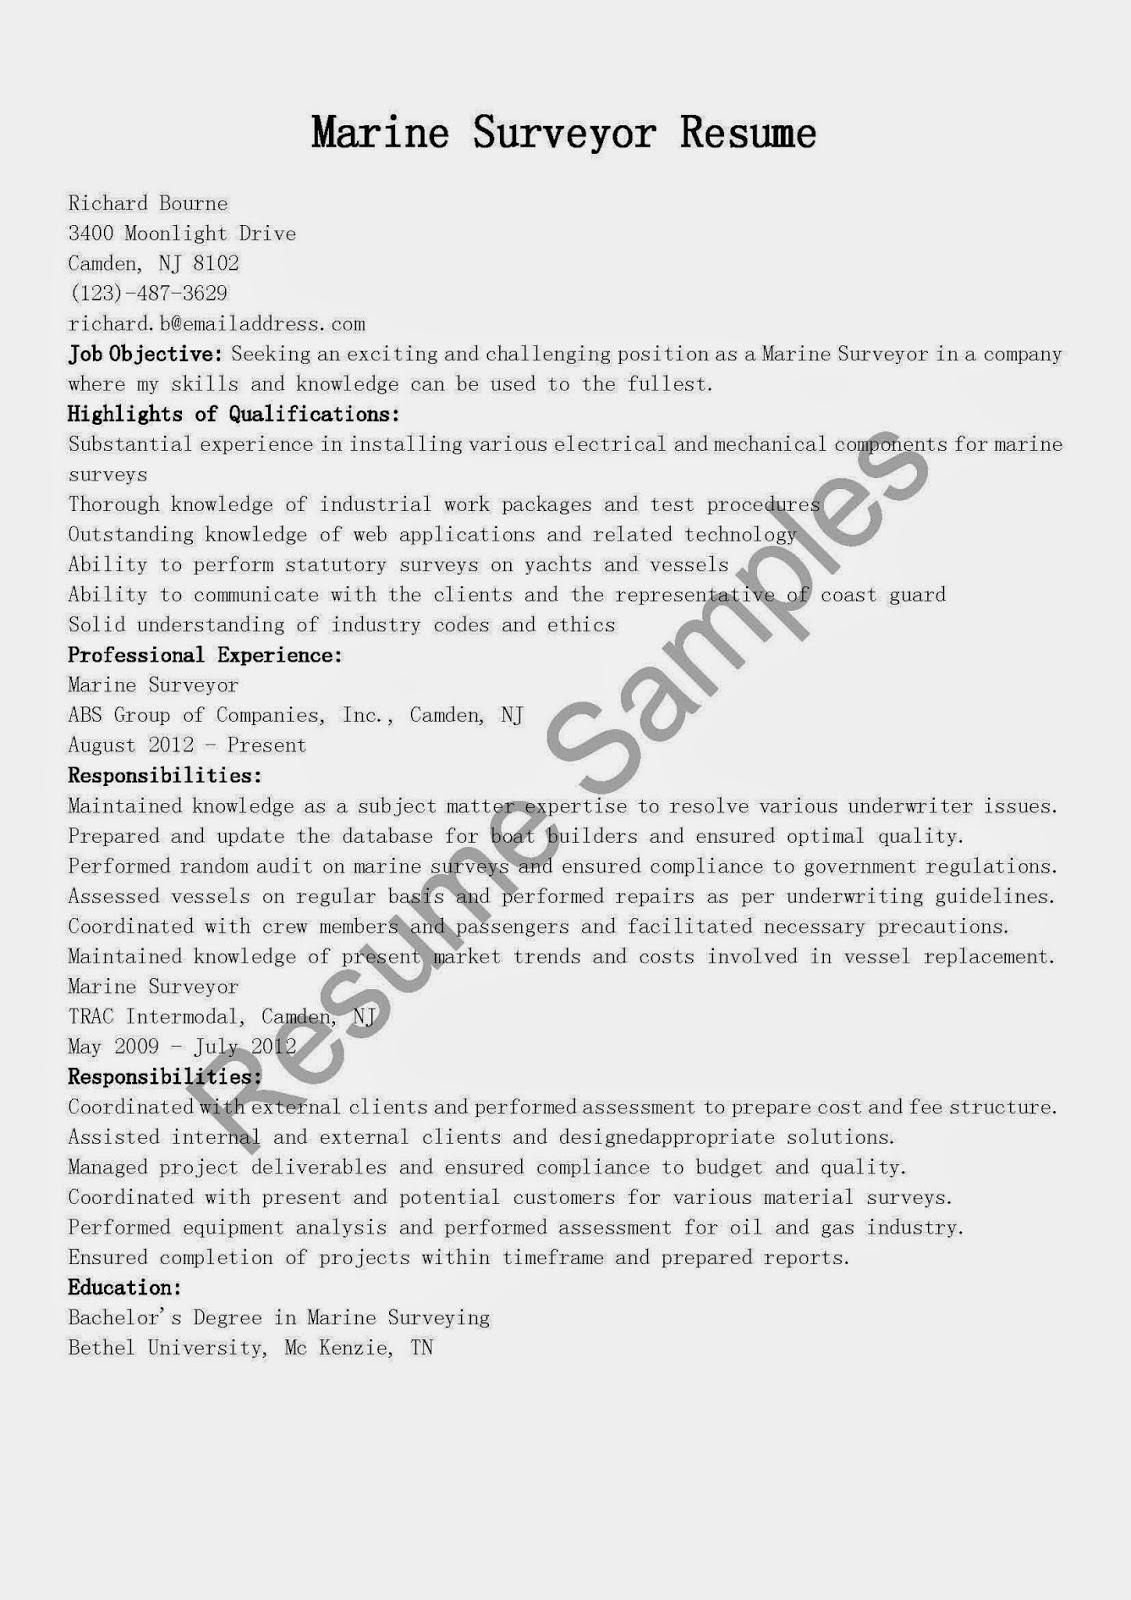 marine corps resume examples resume examples military infantryman marine corps biologist sample resumes design pinterest - Marine Corps Resume Examples